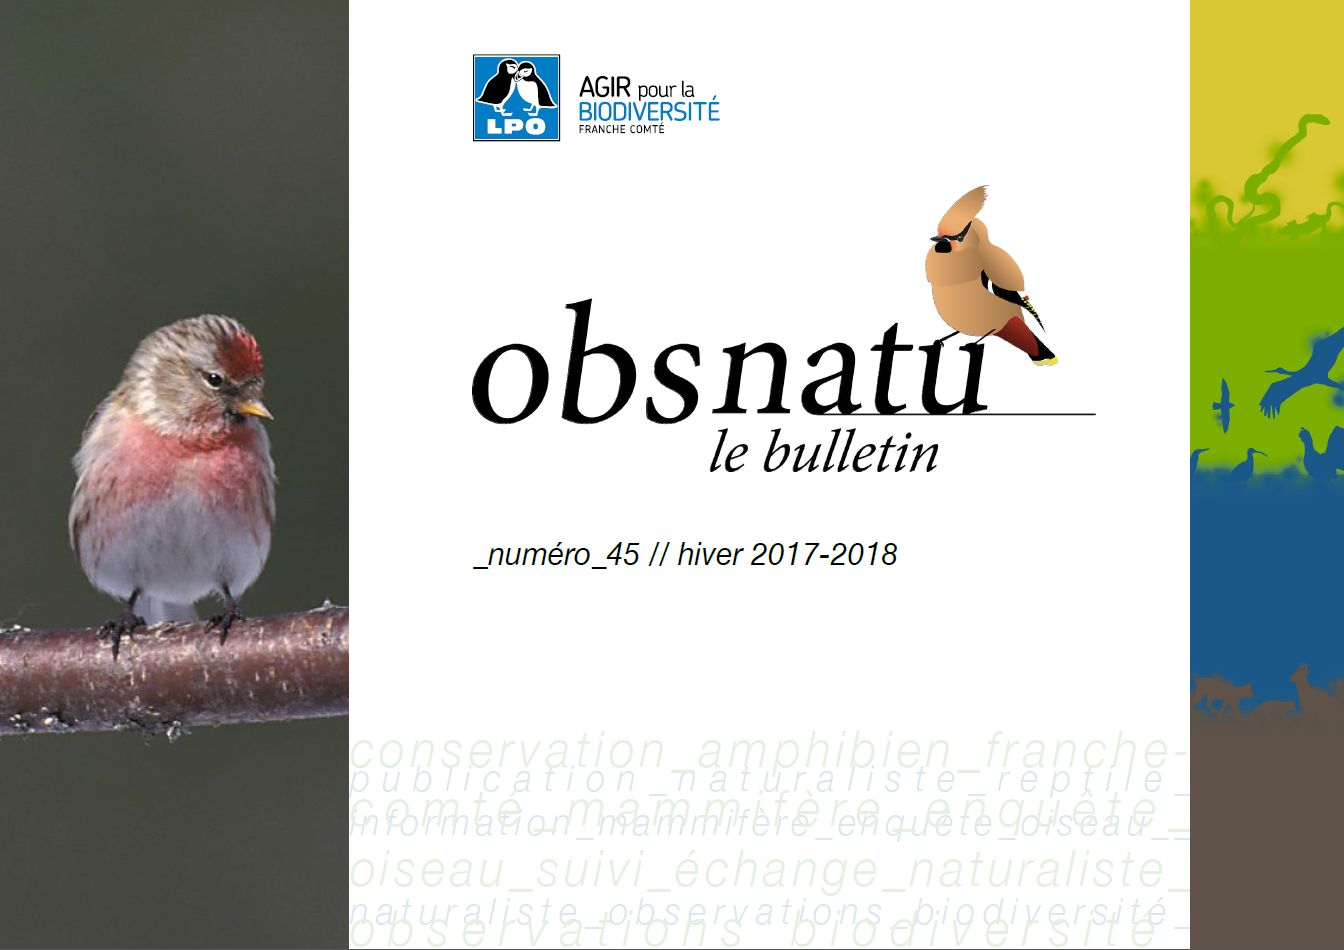 https://cdnfiles2.biolovision.net/franche-comte.lpo.fr/userfiles/publications/Obsnatubulls/Obsnatun45hiver2017-2018couv.jpg